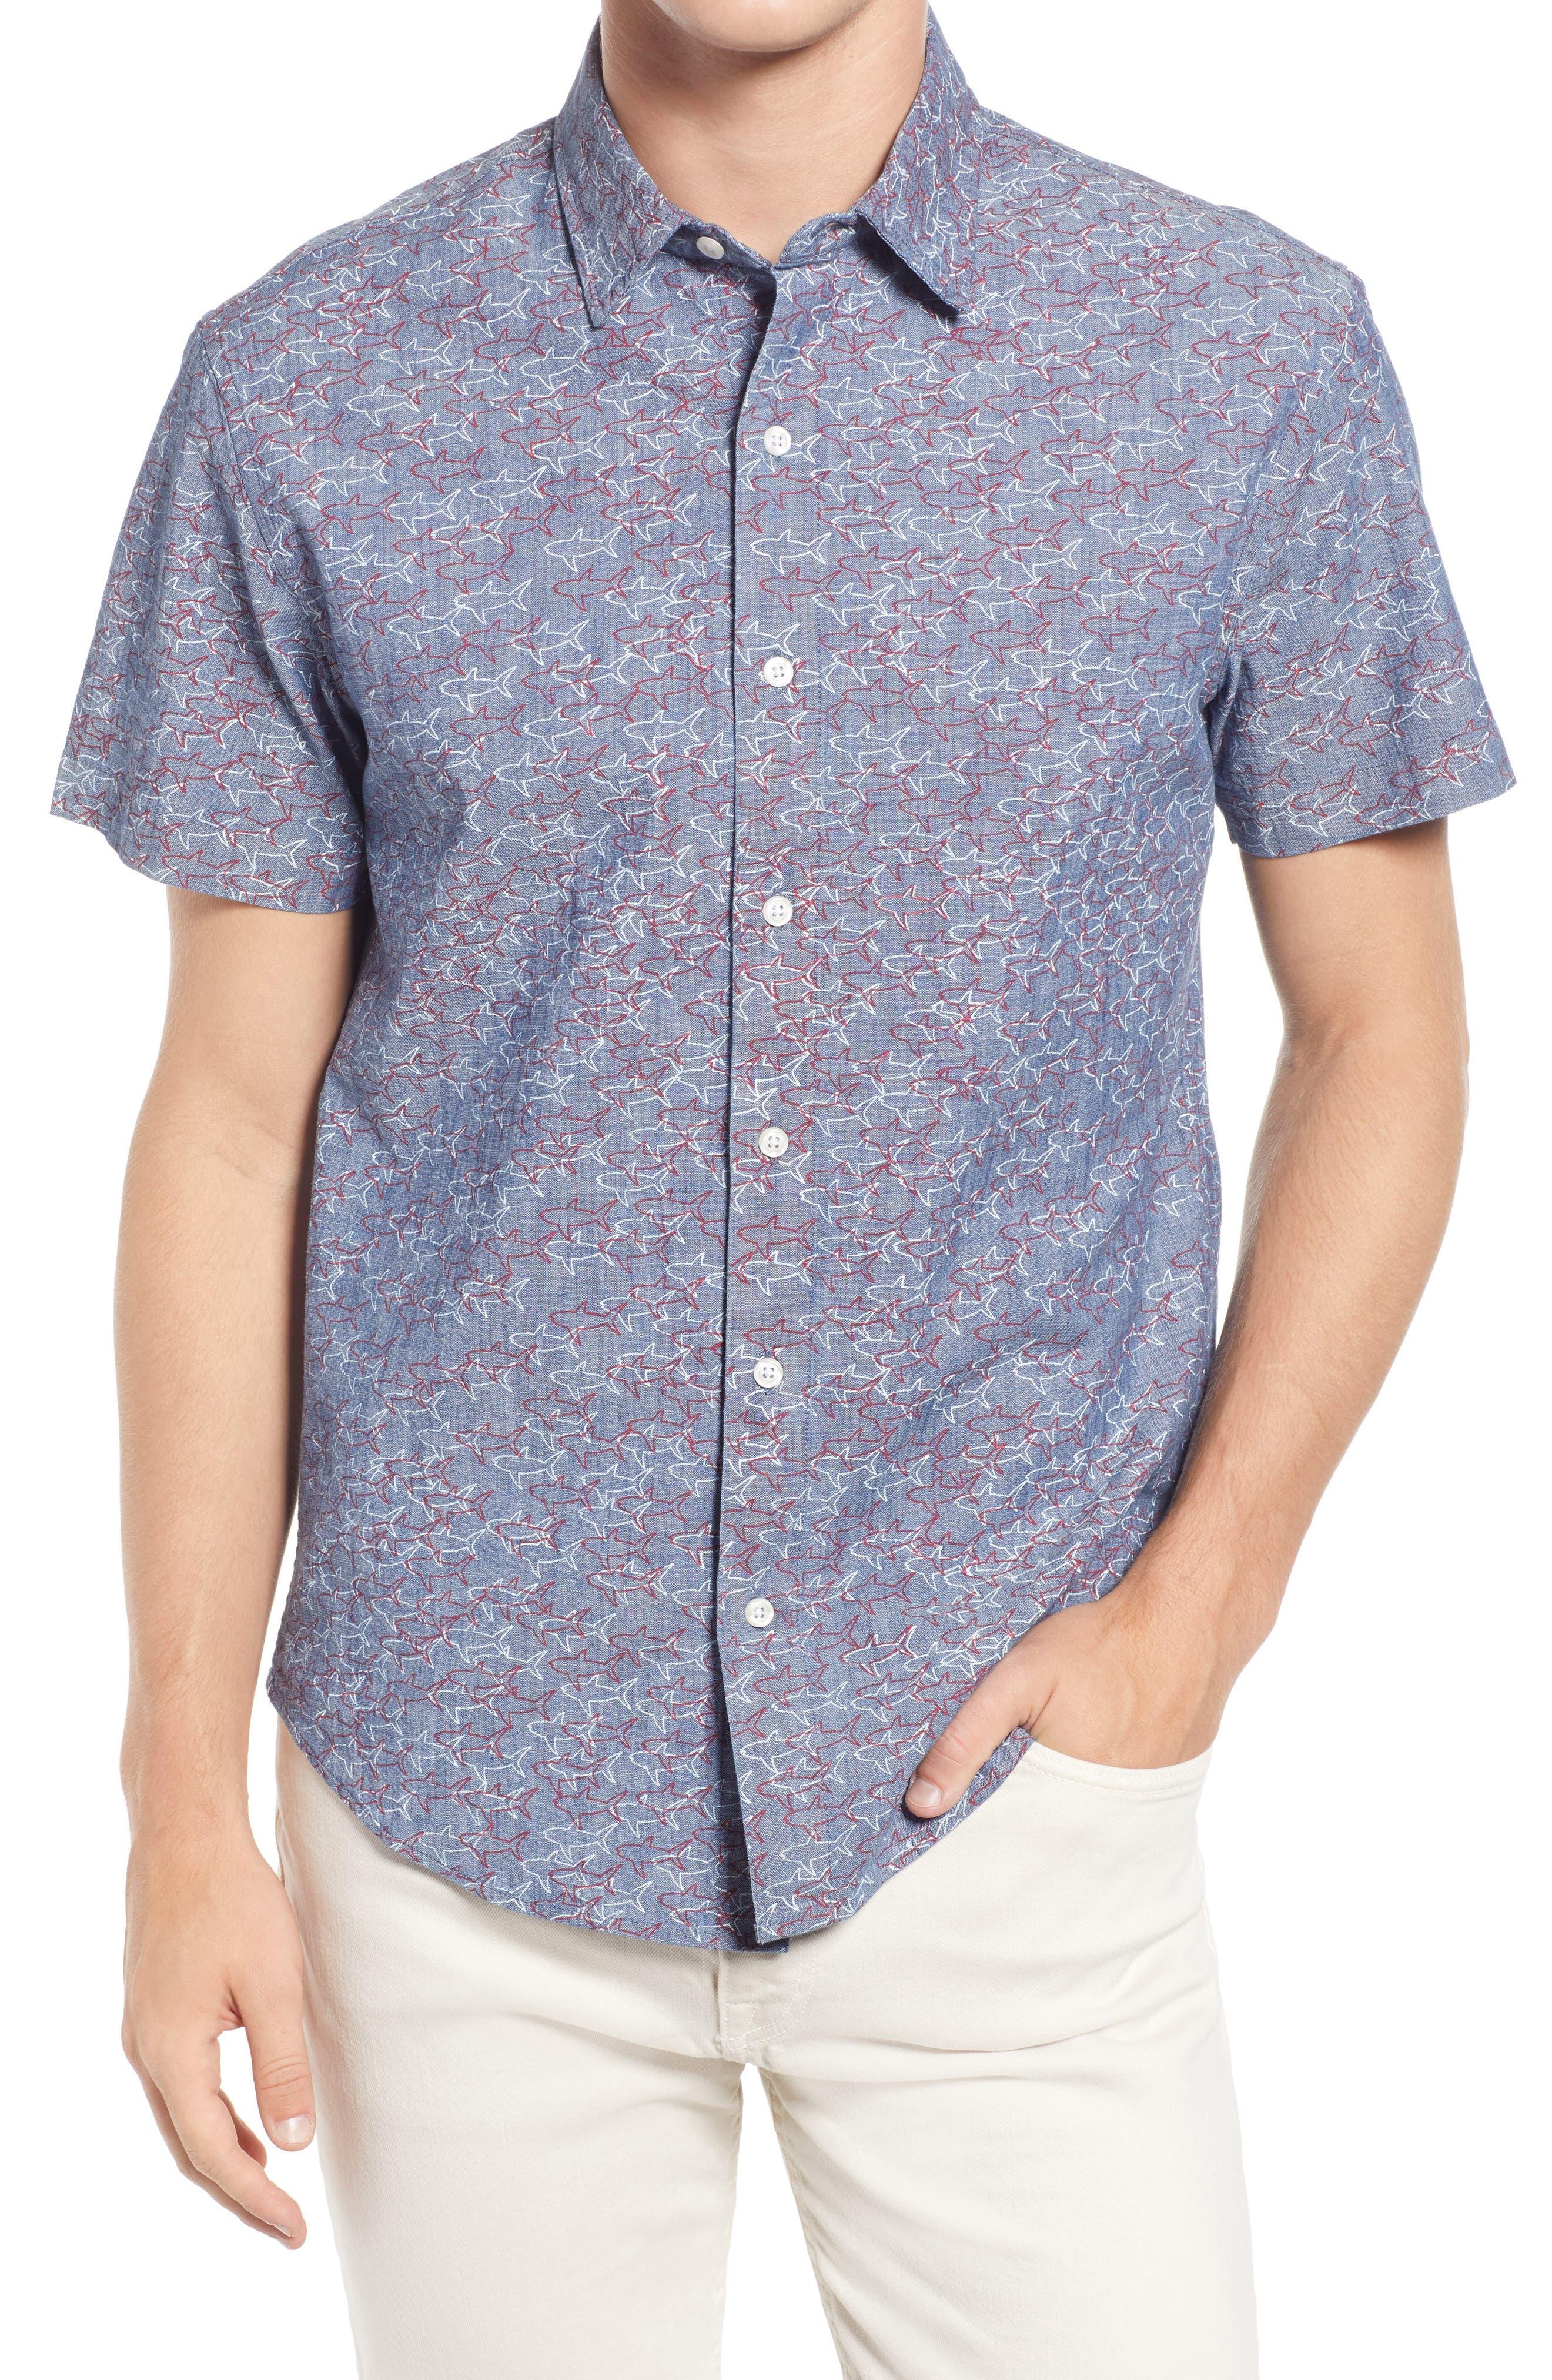 Riviera Slim Fit Shark Print Short Sleeve Stretch Button-Up Shirt